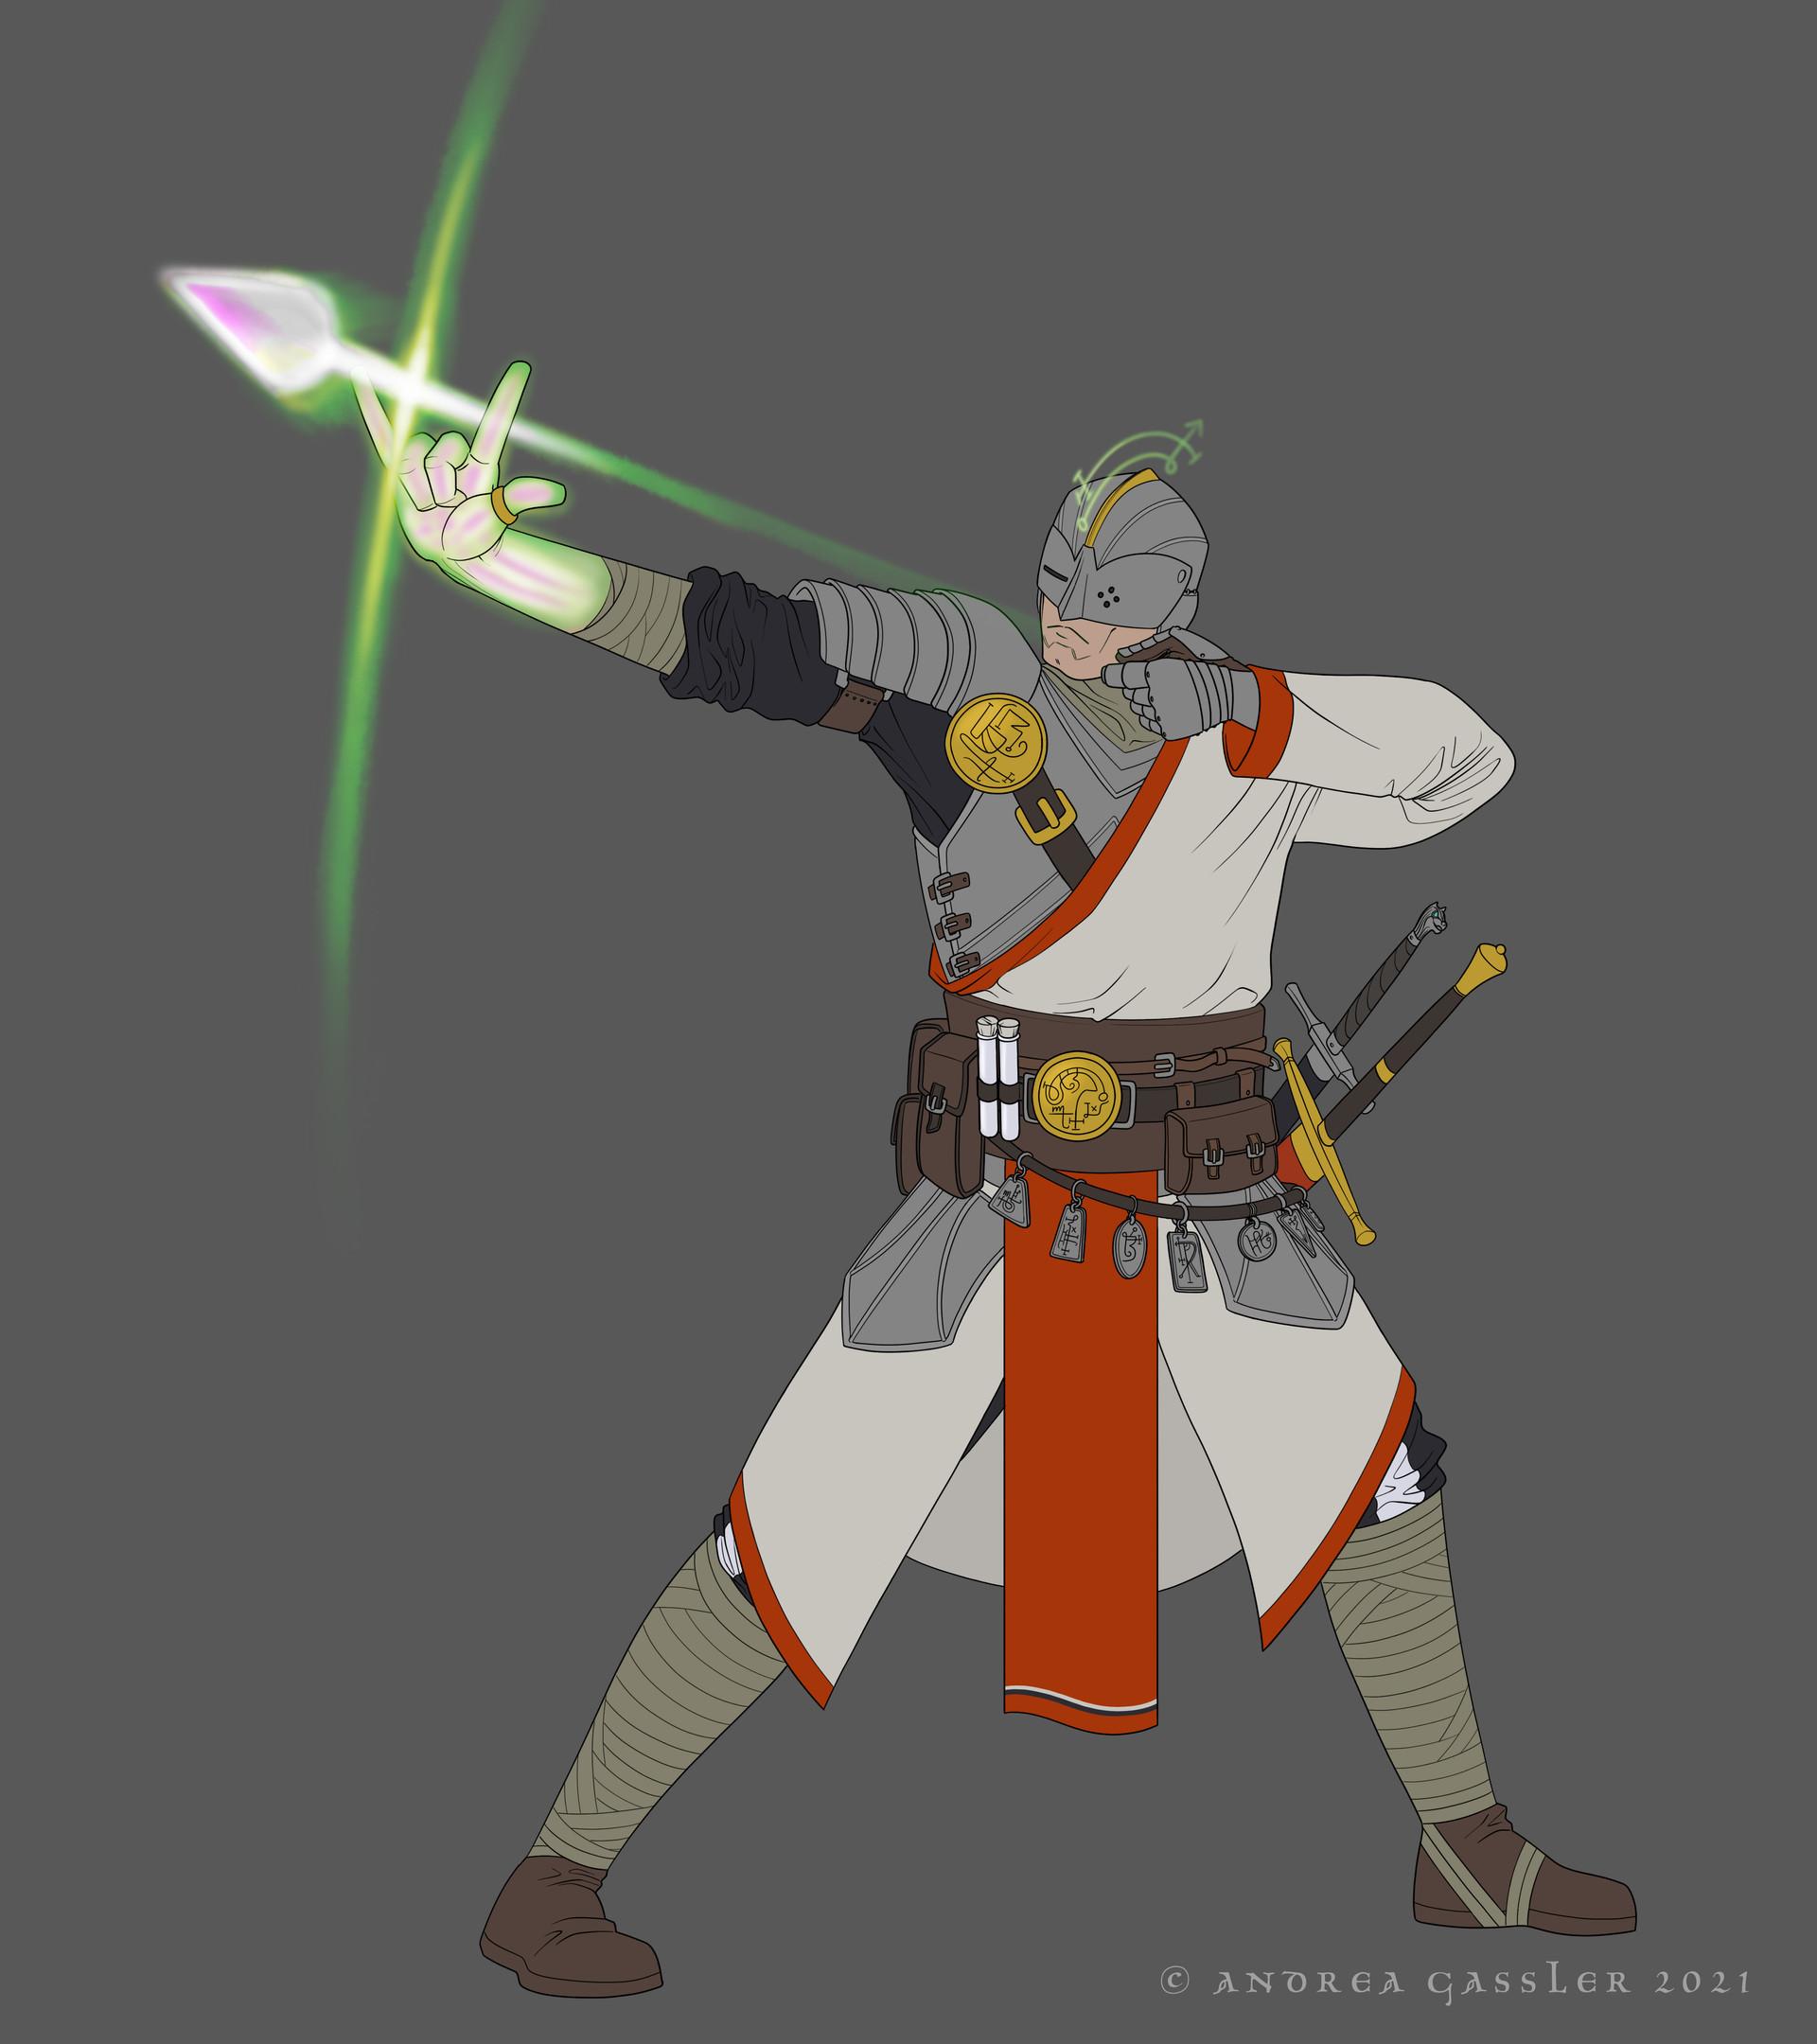 Archer Battlemage